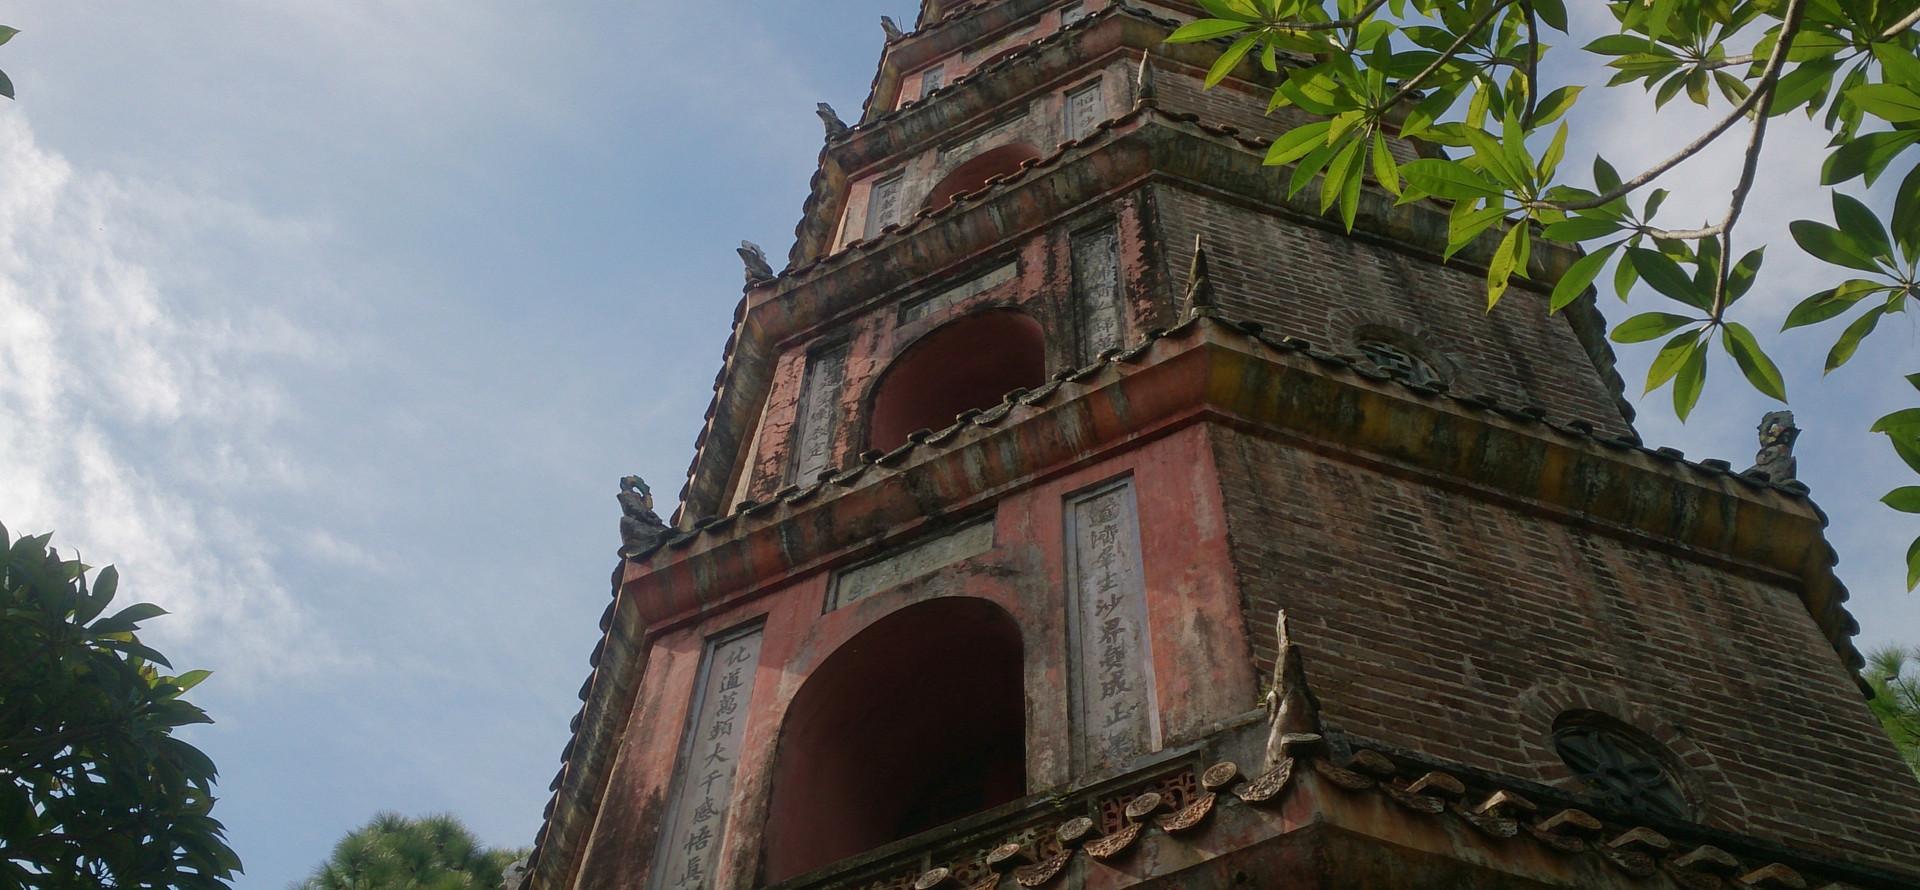 Thien Mu, Pagoda Of The Celestial Lady In Hue, Vietnam